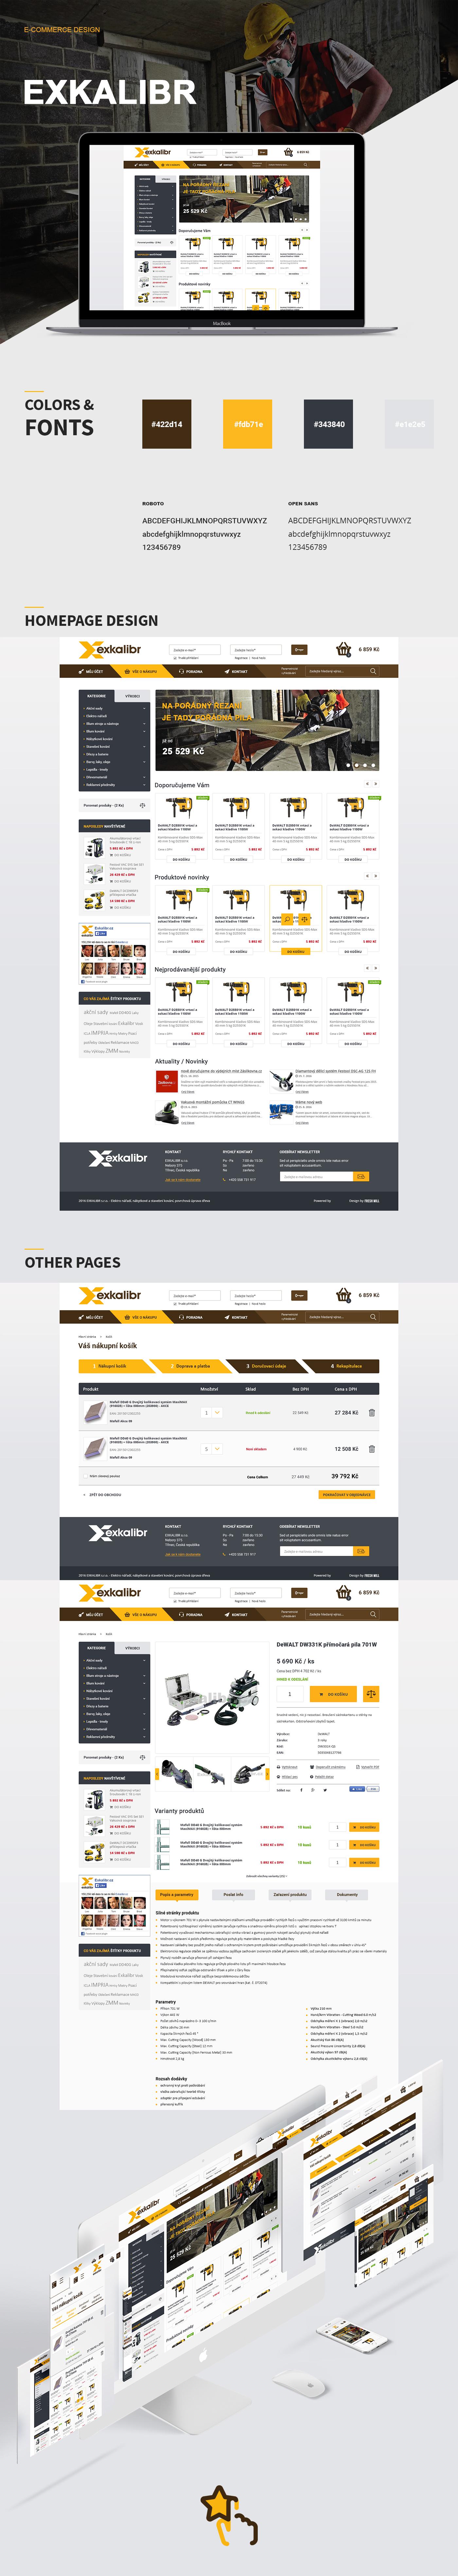 Web design eshop Ecommerce tools jaroslavhach build graphic